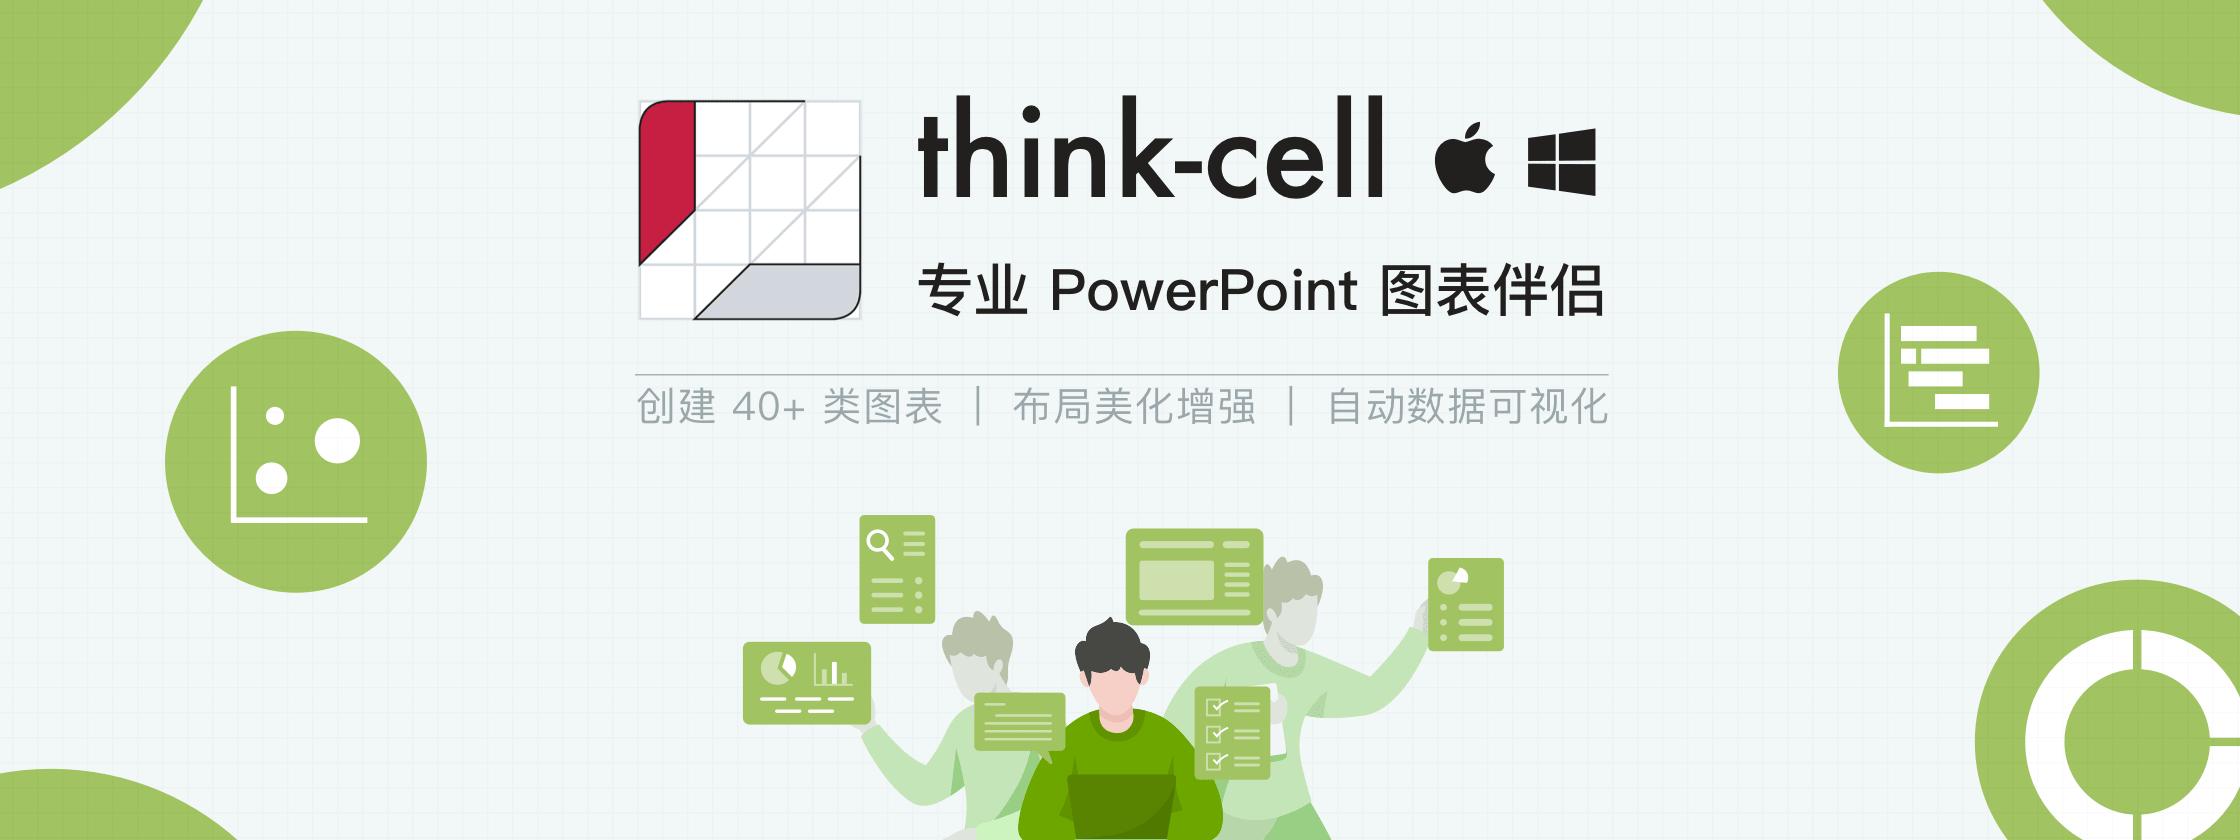 think-cell – 专业 PPT 图表优化辅助工具